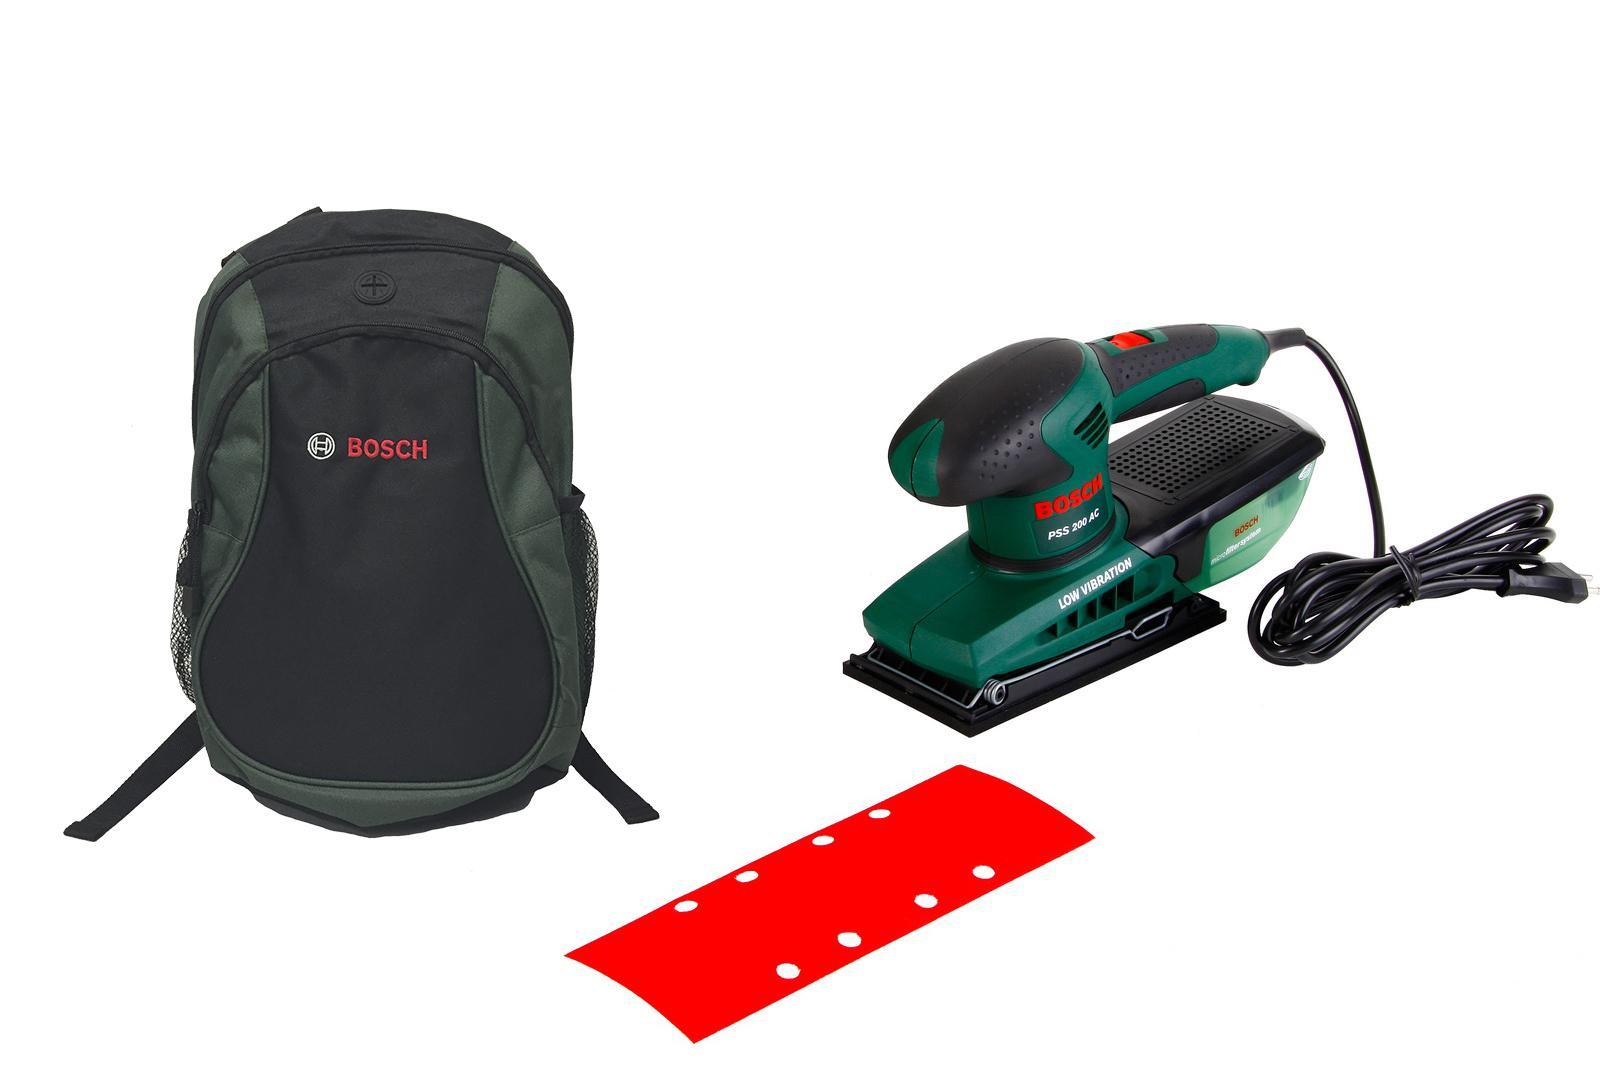 Набор Bosch шлиф.машинка плоская pss 200 ac (0603340120) + рюкзак green (1619g45200)